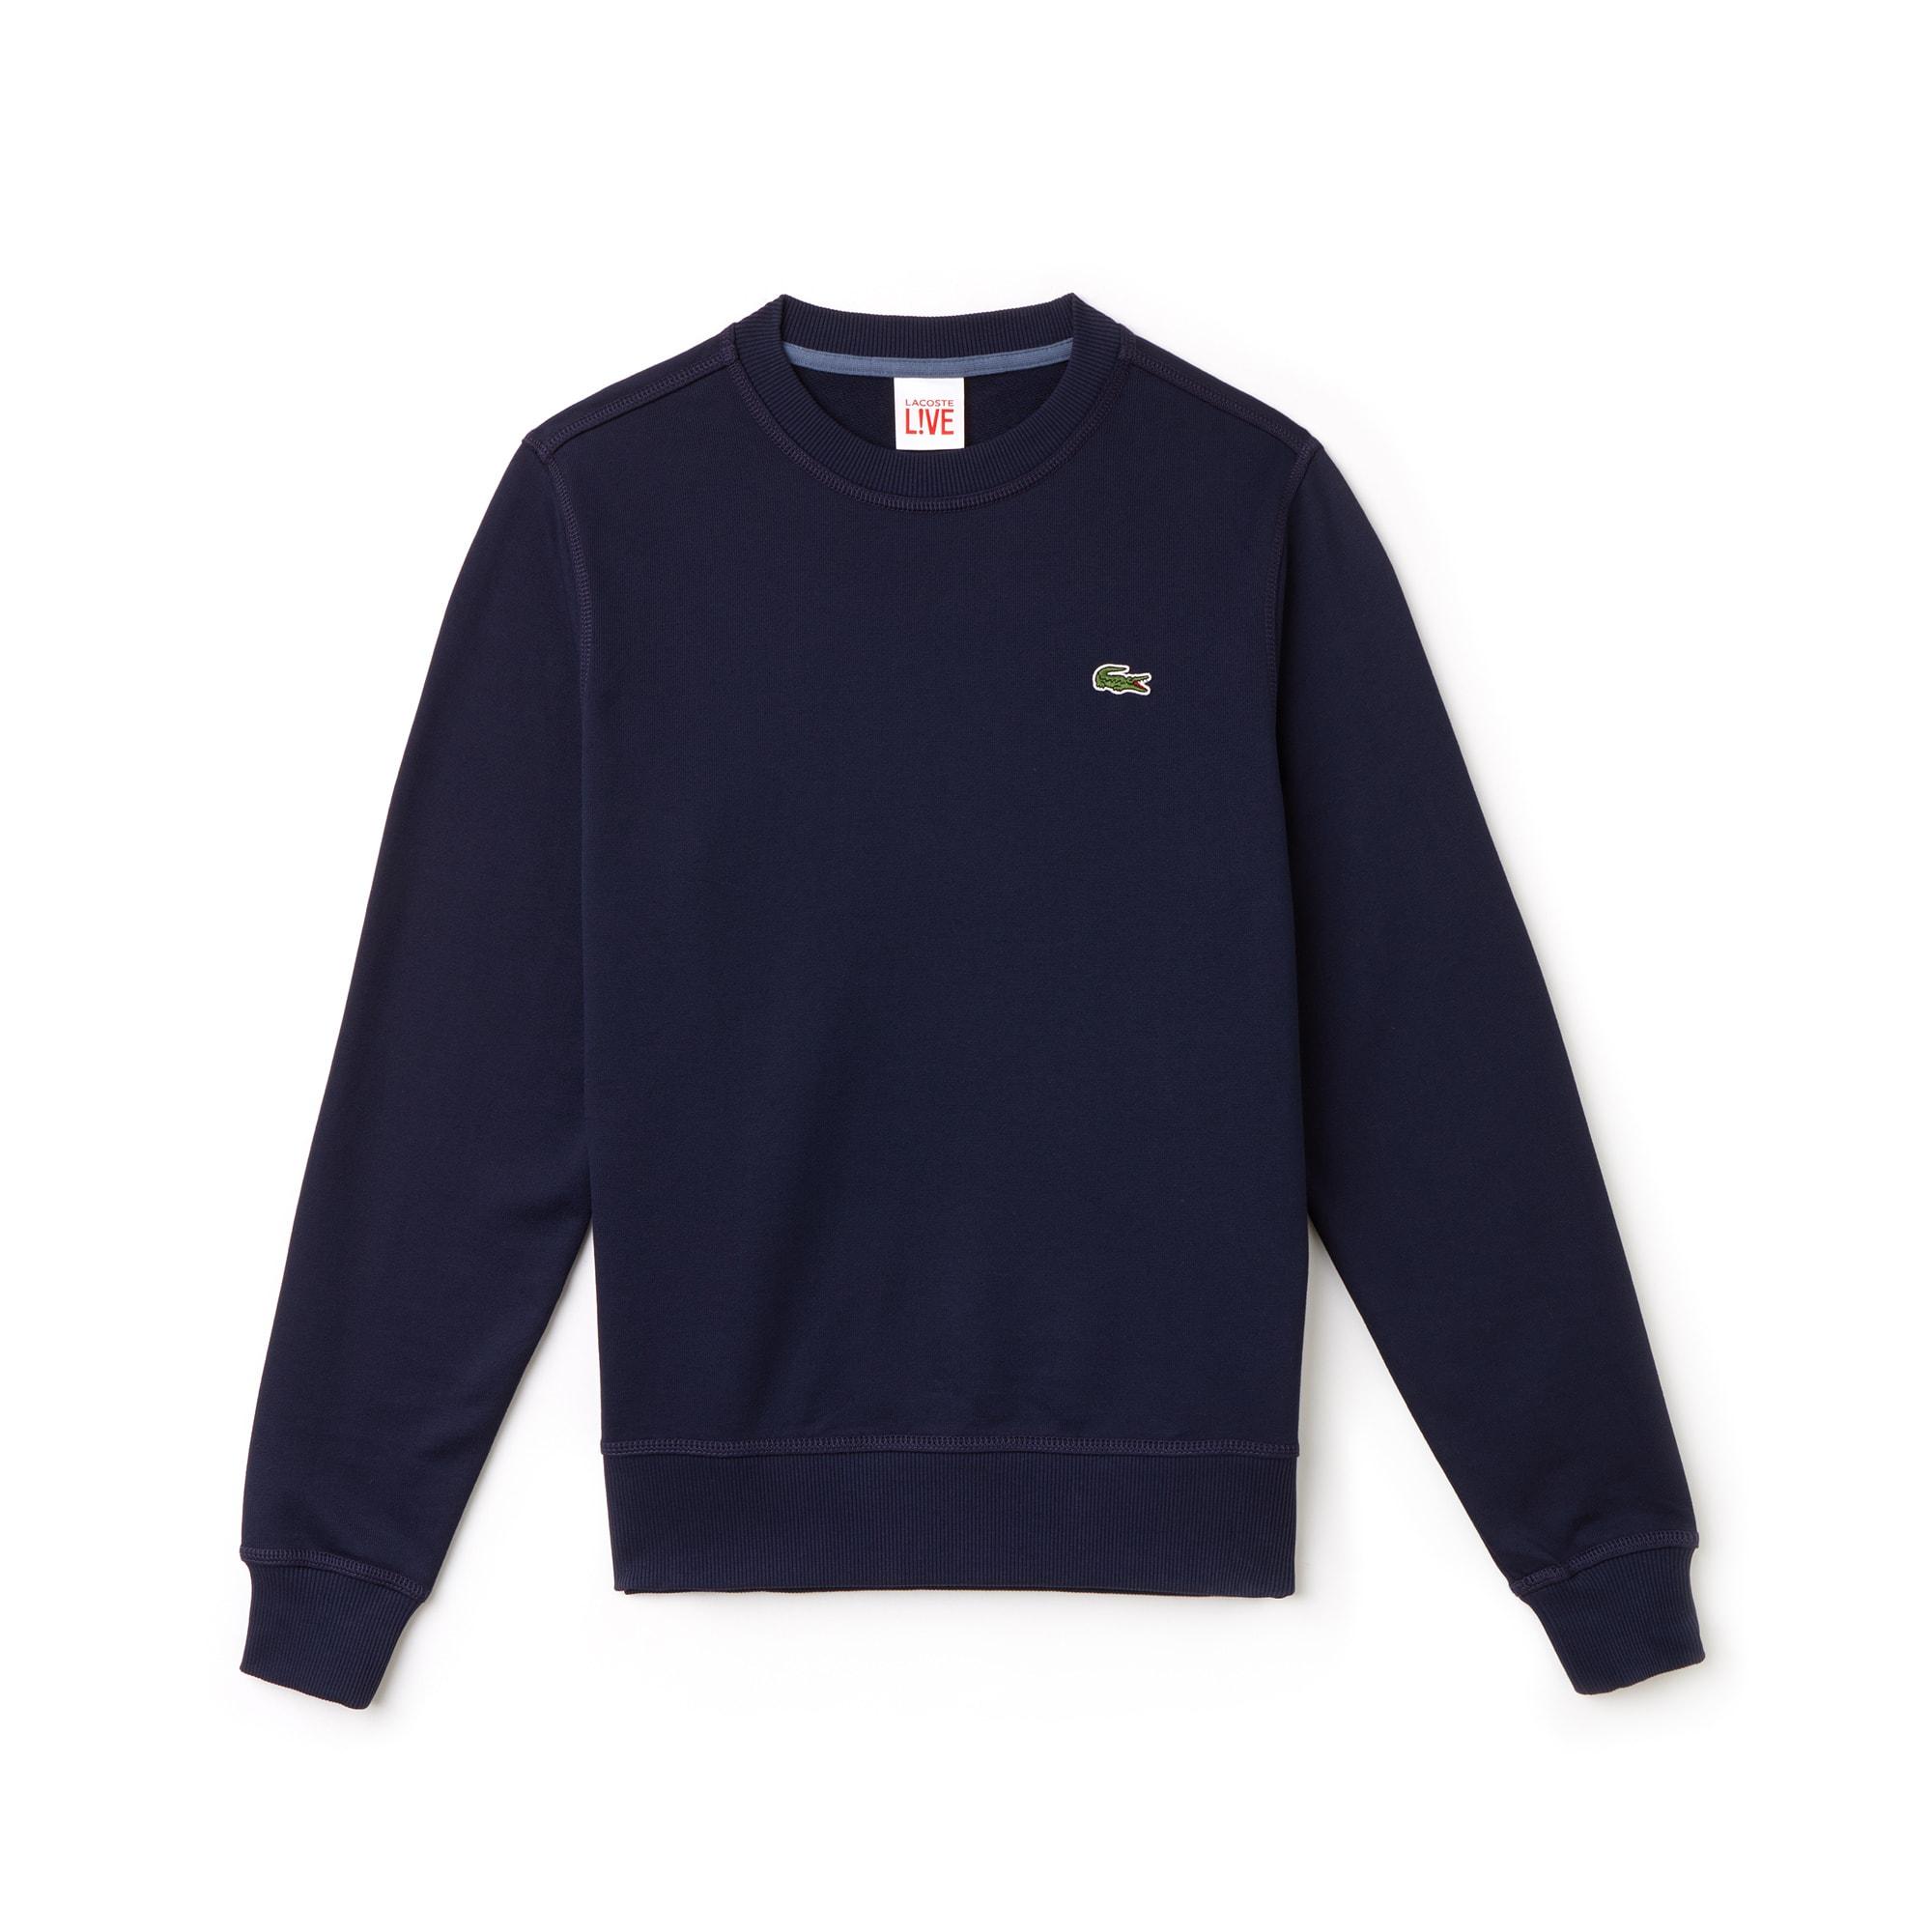 Lacoste LIVE系列圆领棉质拉绒运动衫,男女皆宜